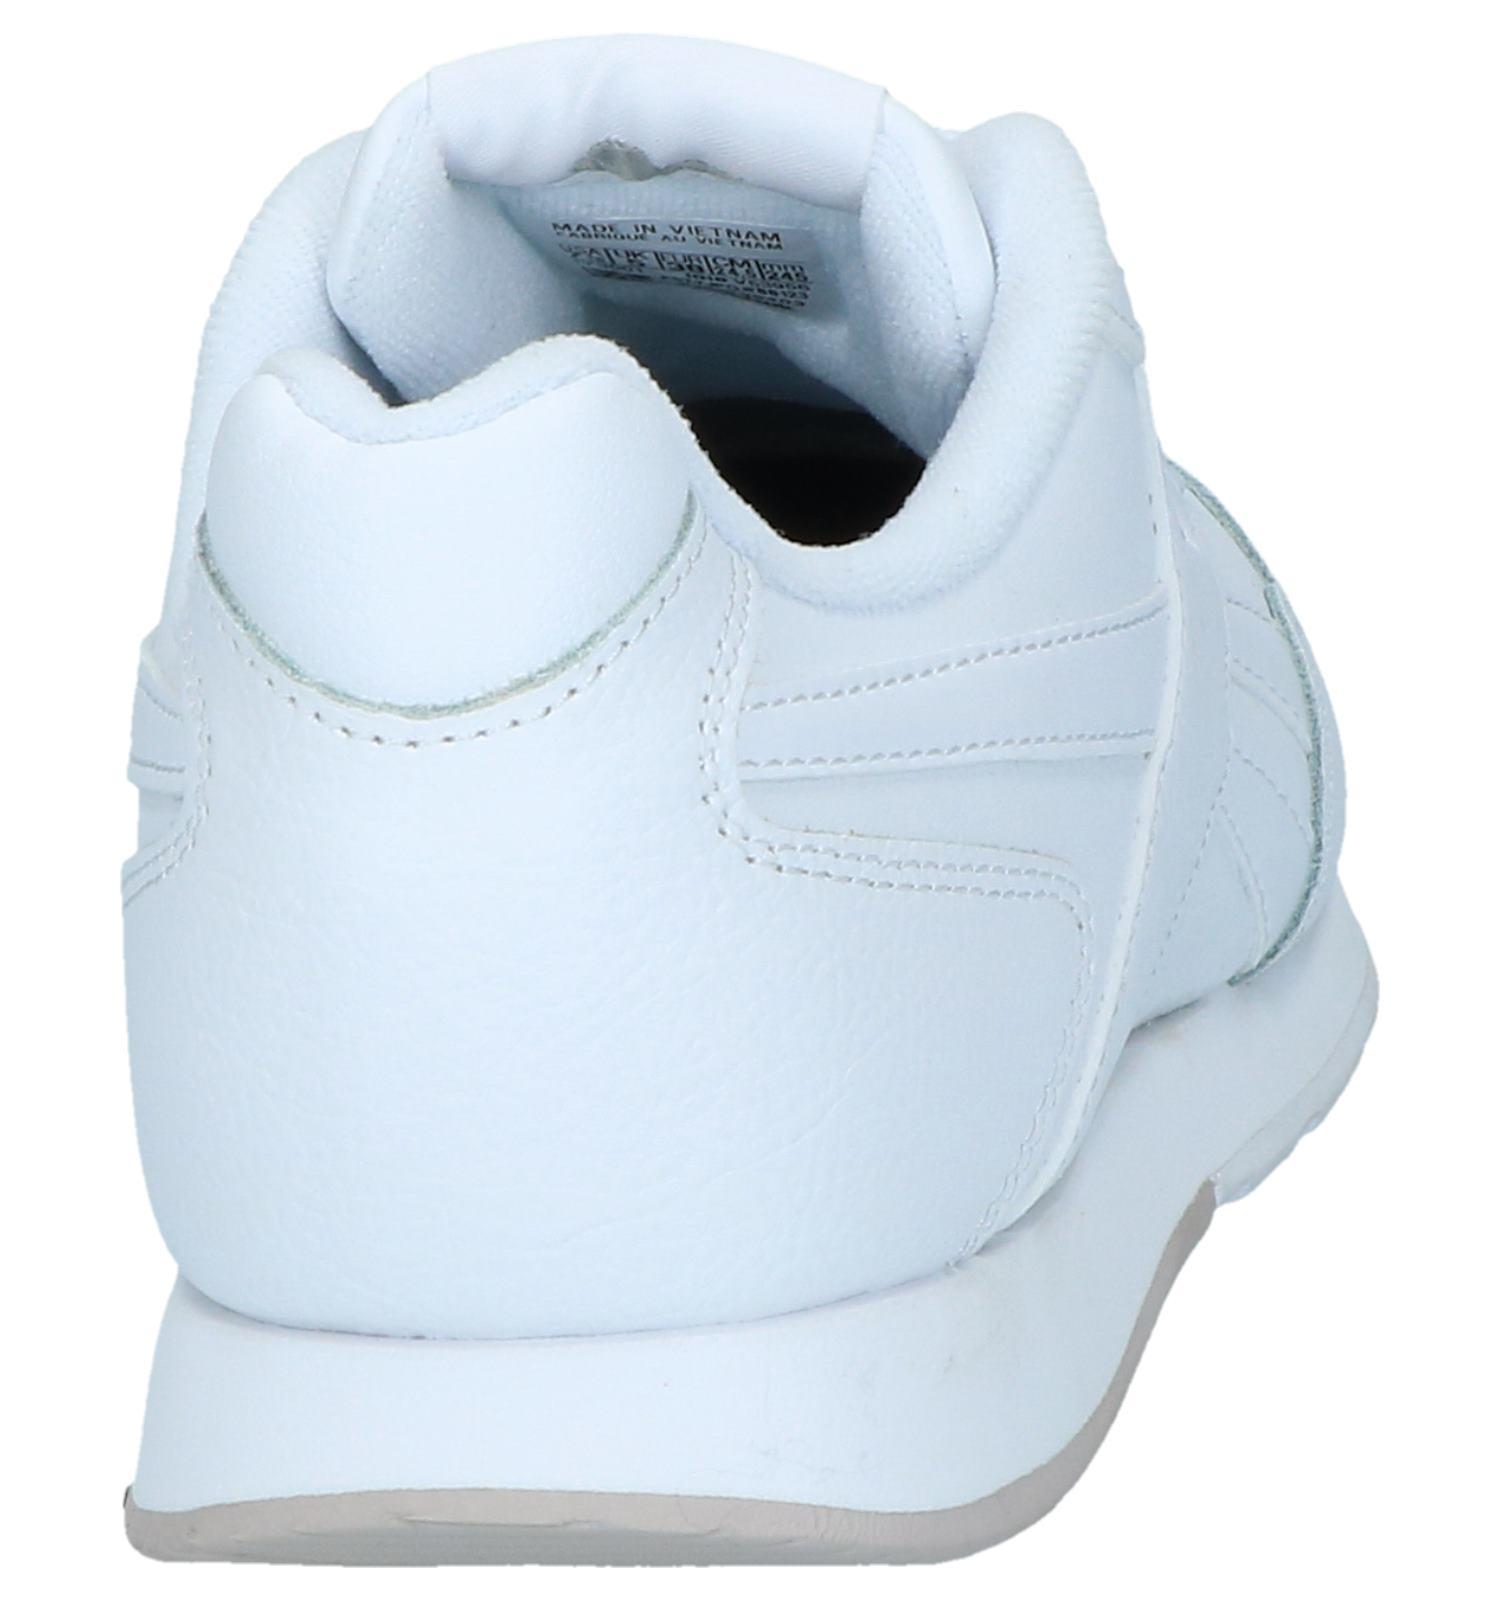 bf5b459bf40 Witte Sneakers Reebok Royal Glide   TORFS.BE   Gratis verzend en retour